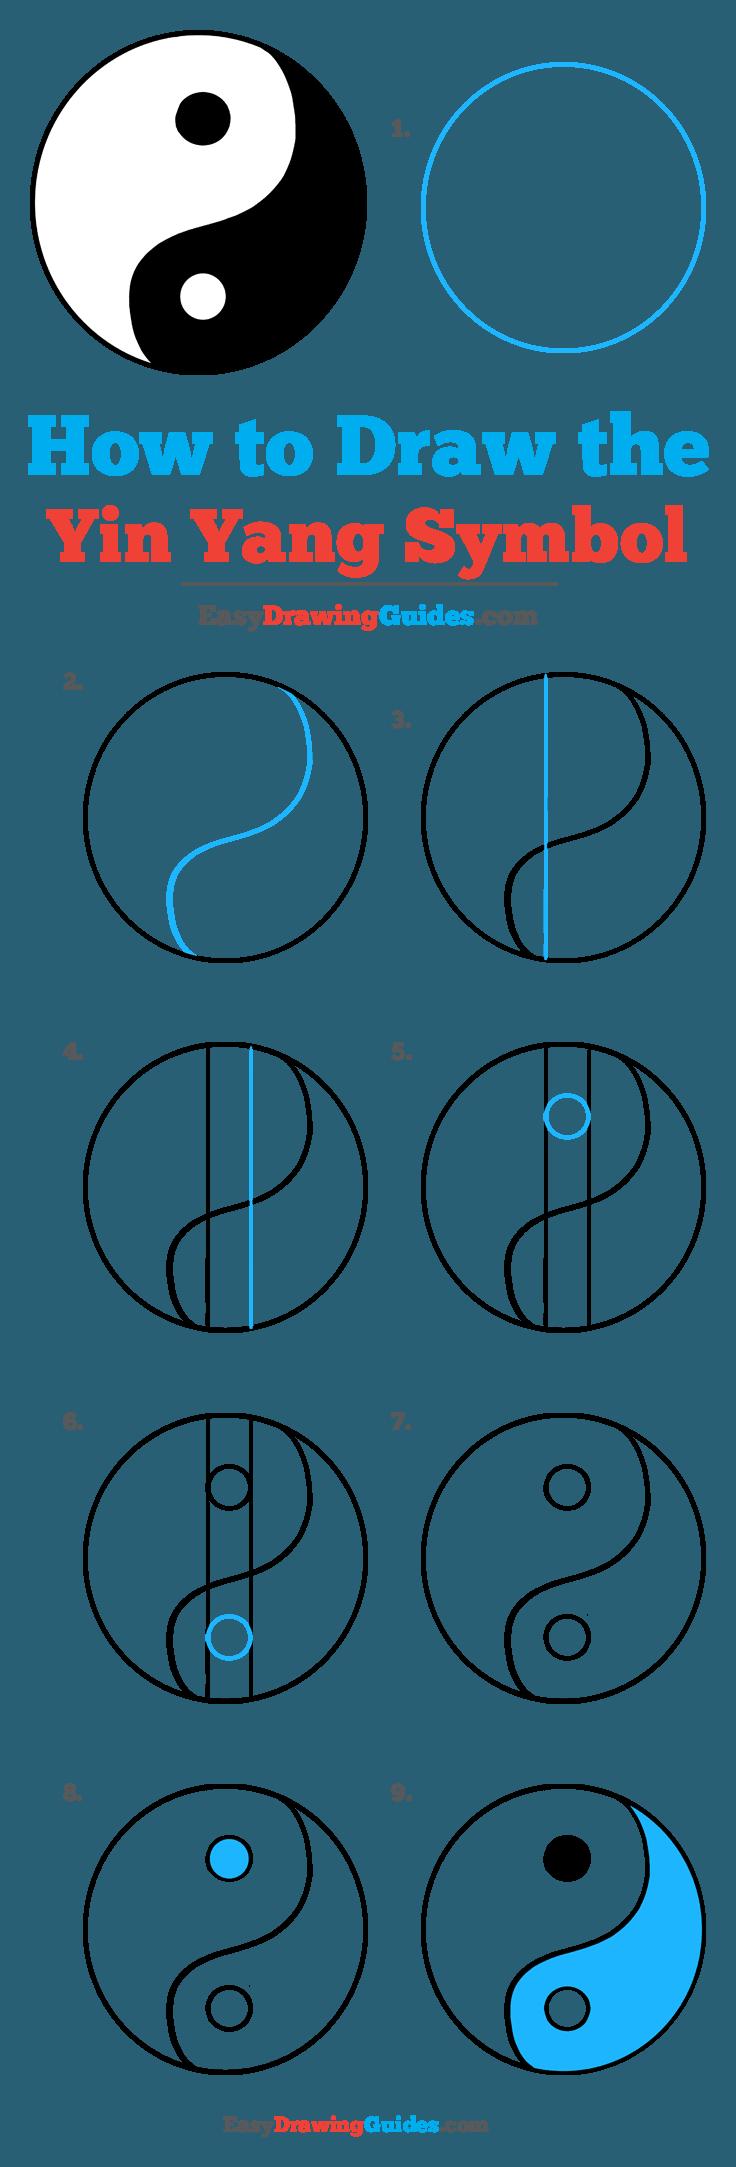 How to Draw Yin Yang Symbol